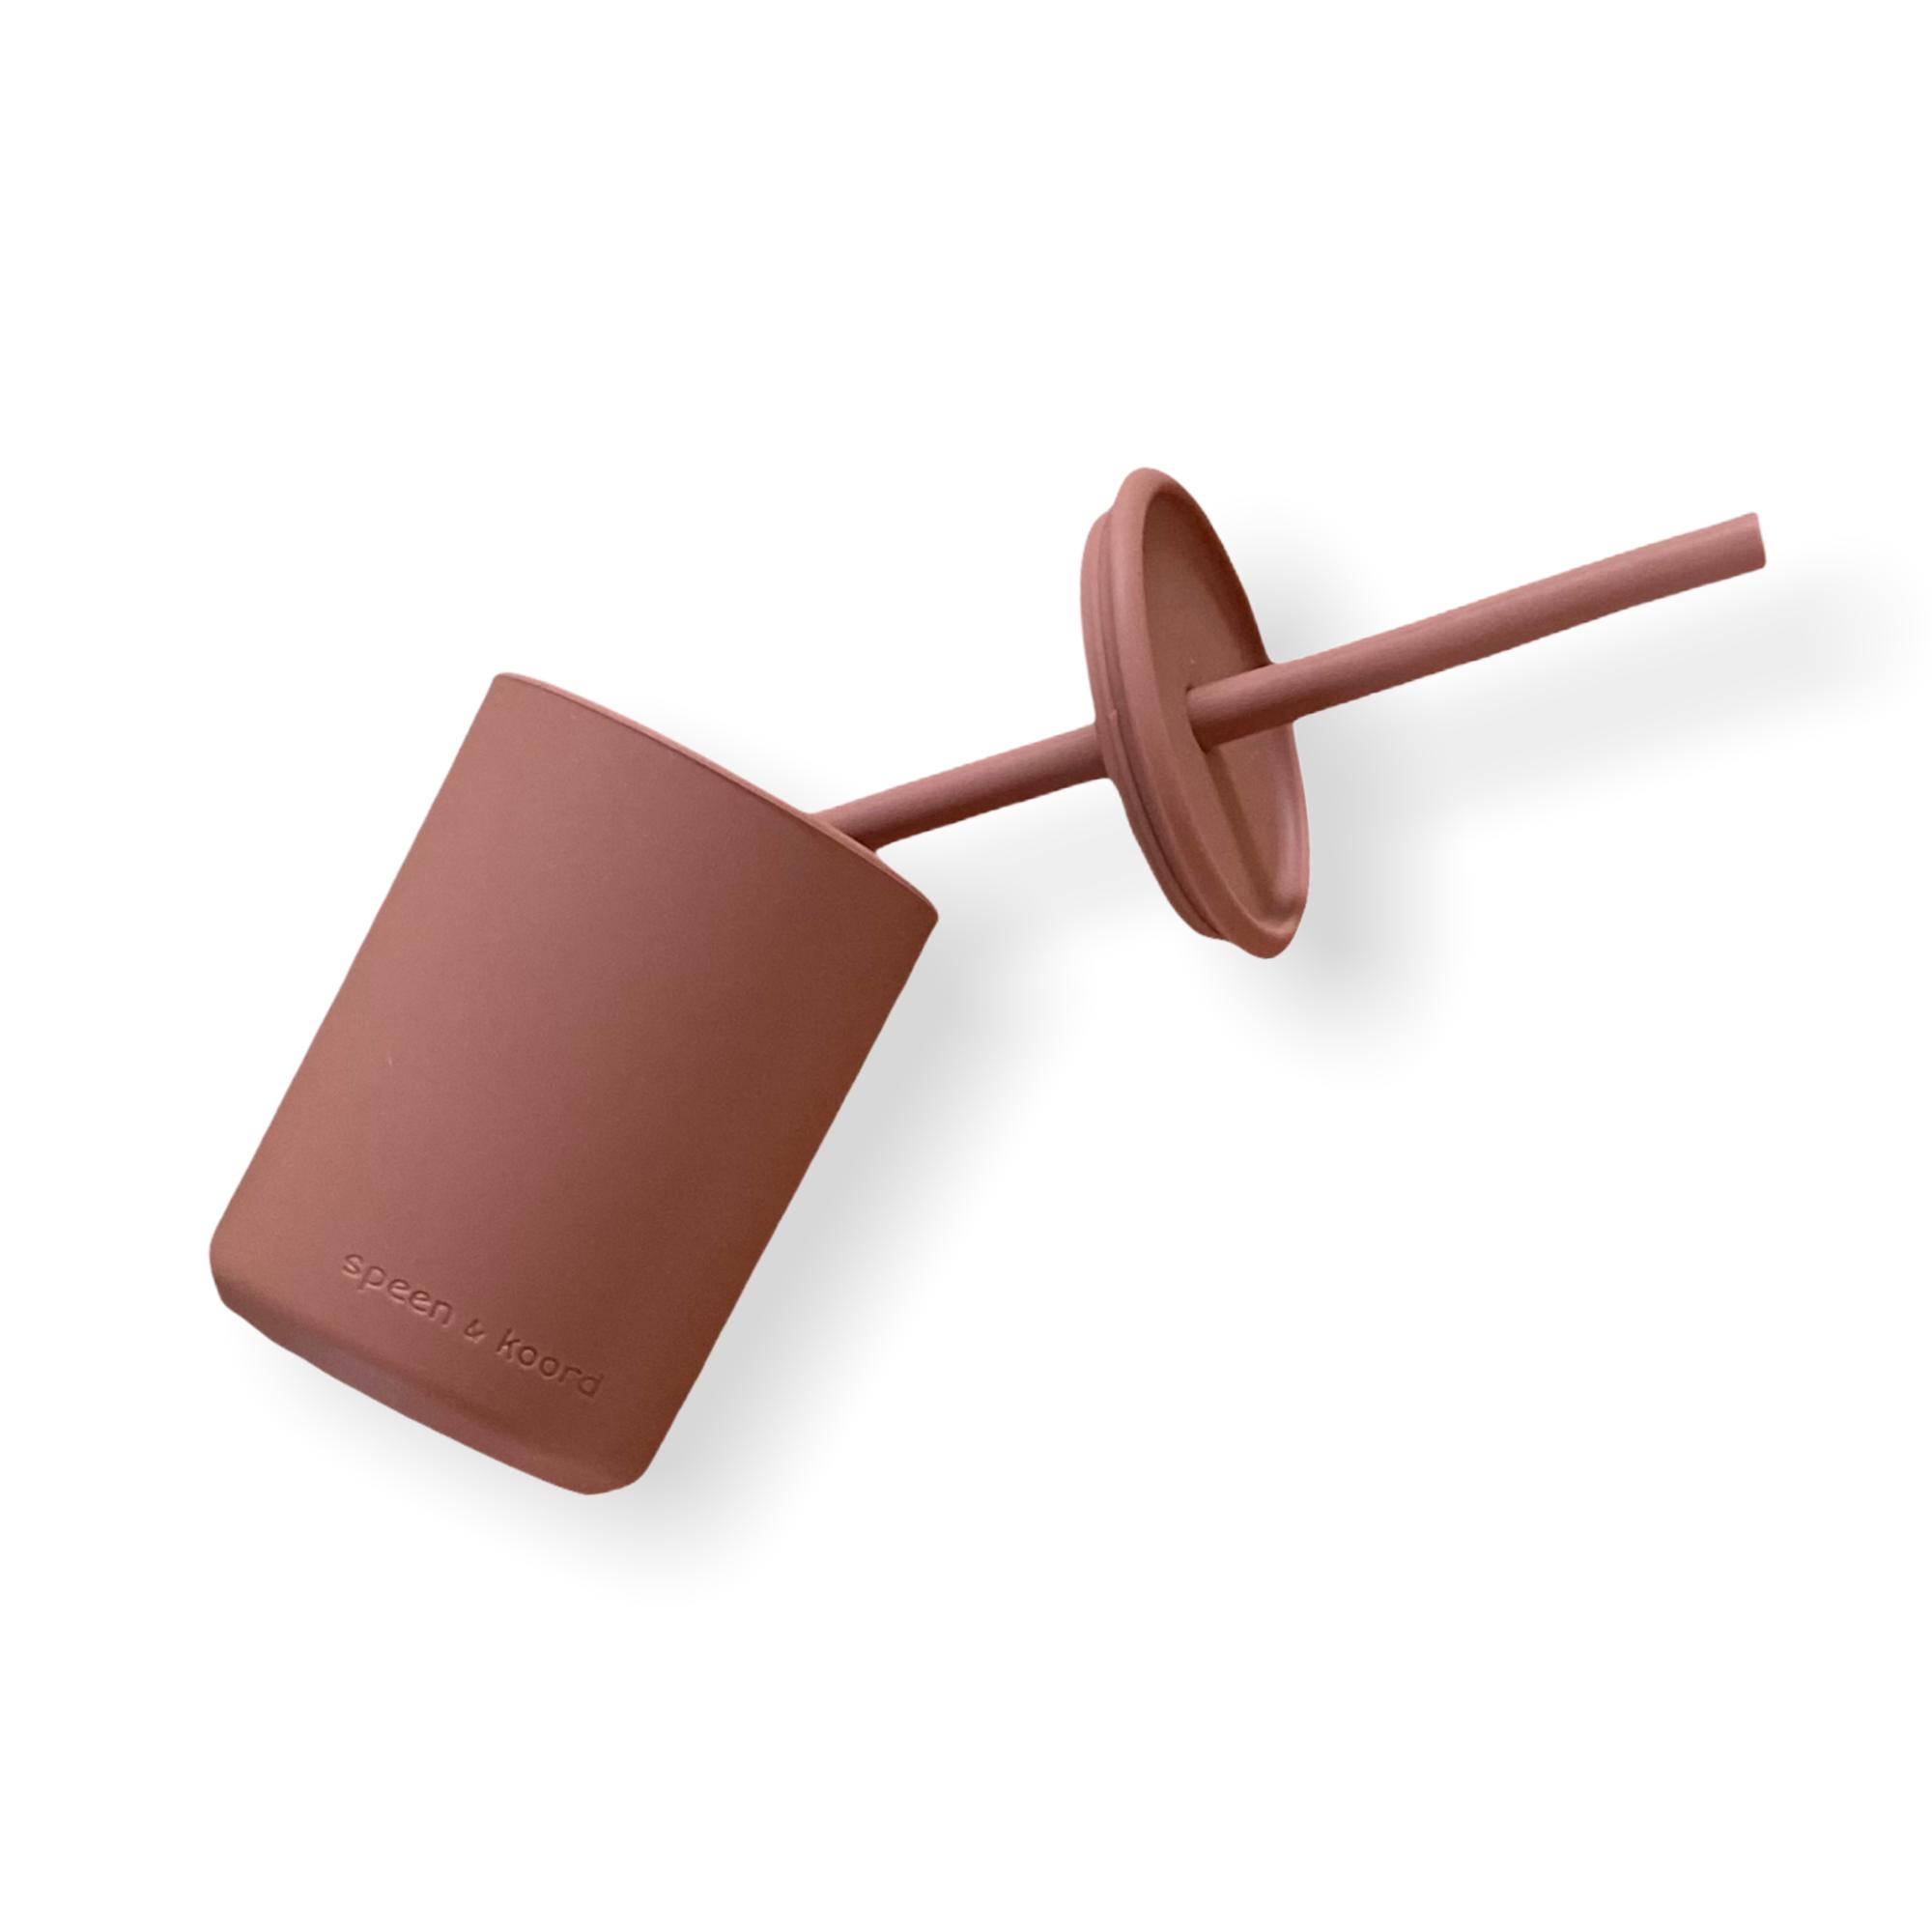 Afbeelding Speen & Koord Straw cups I Sandal